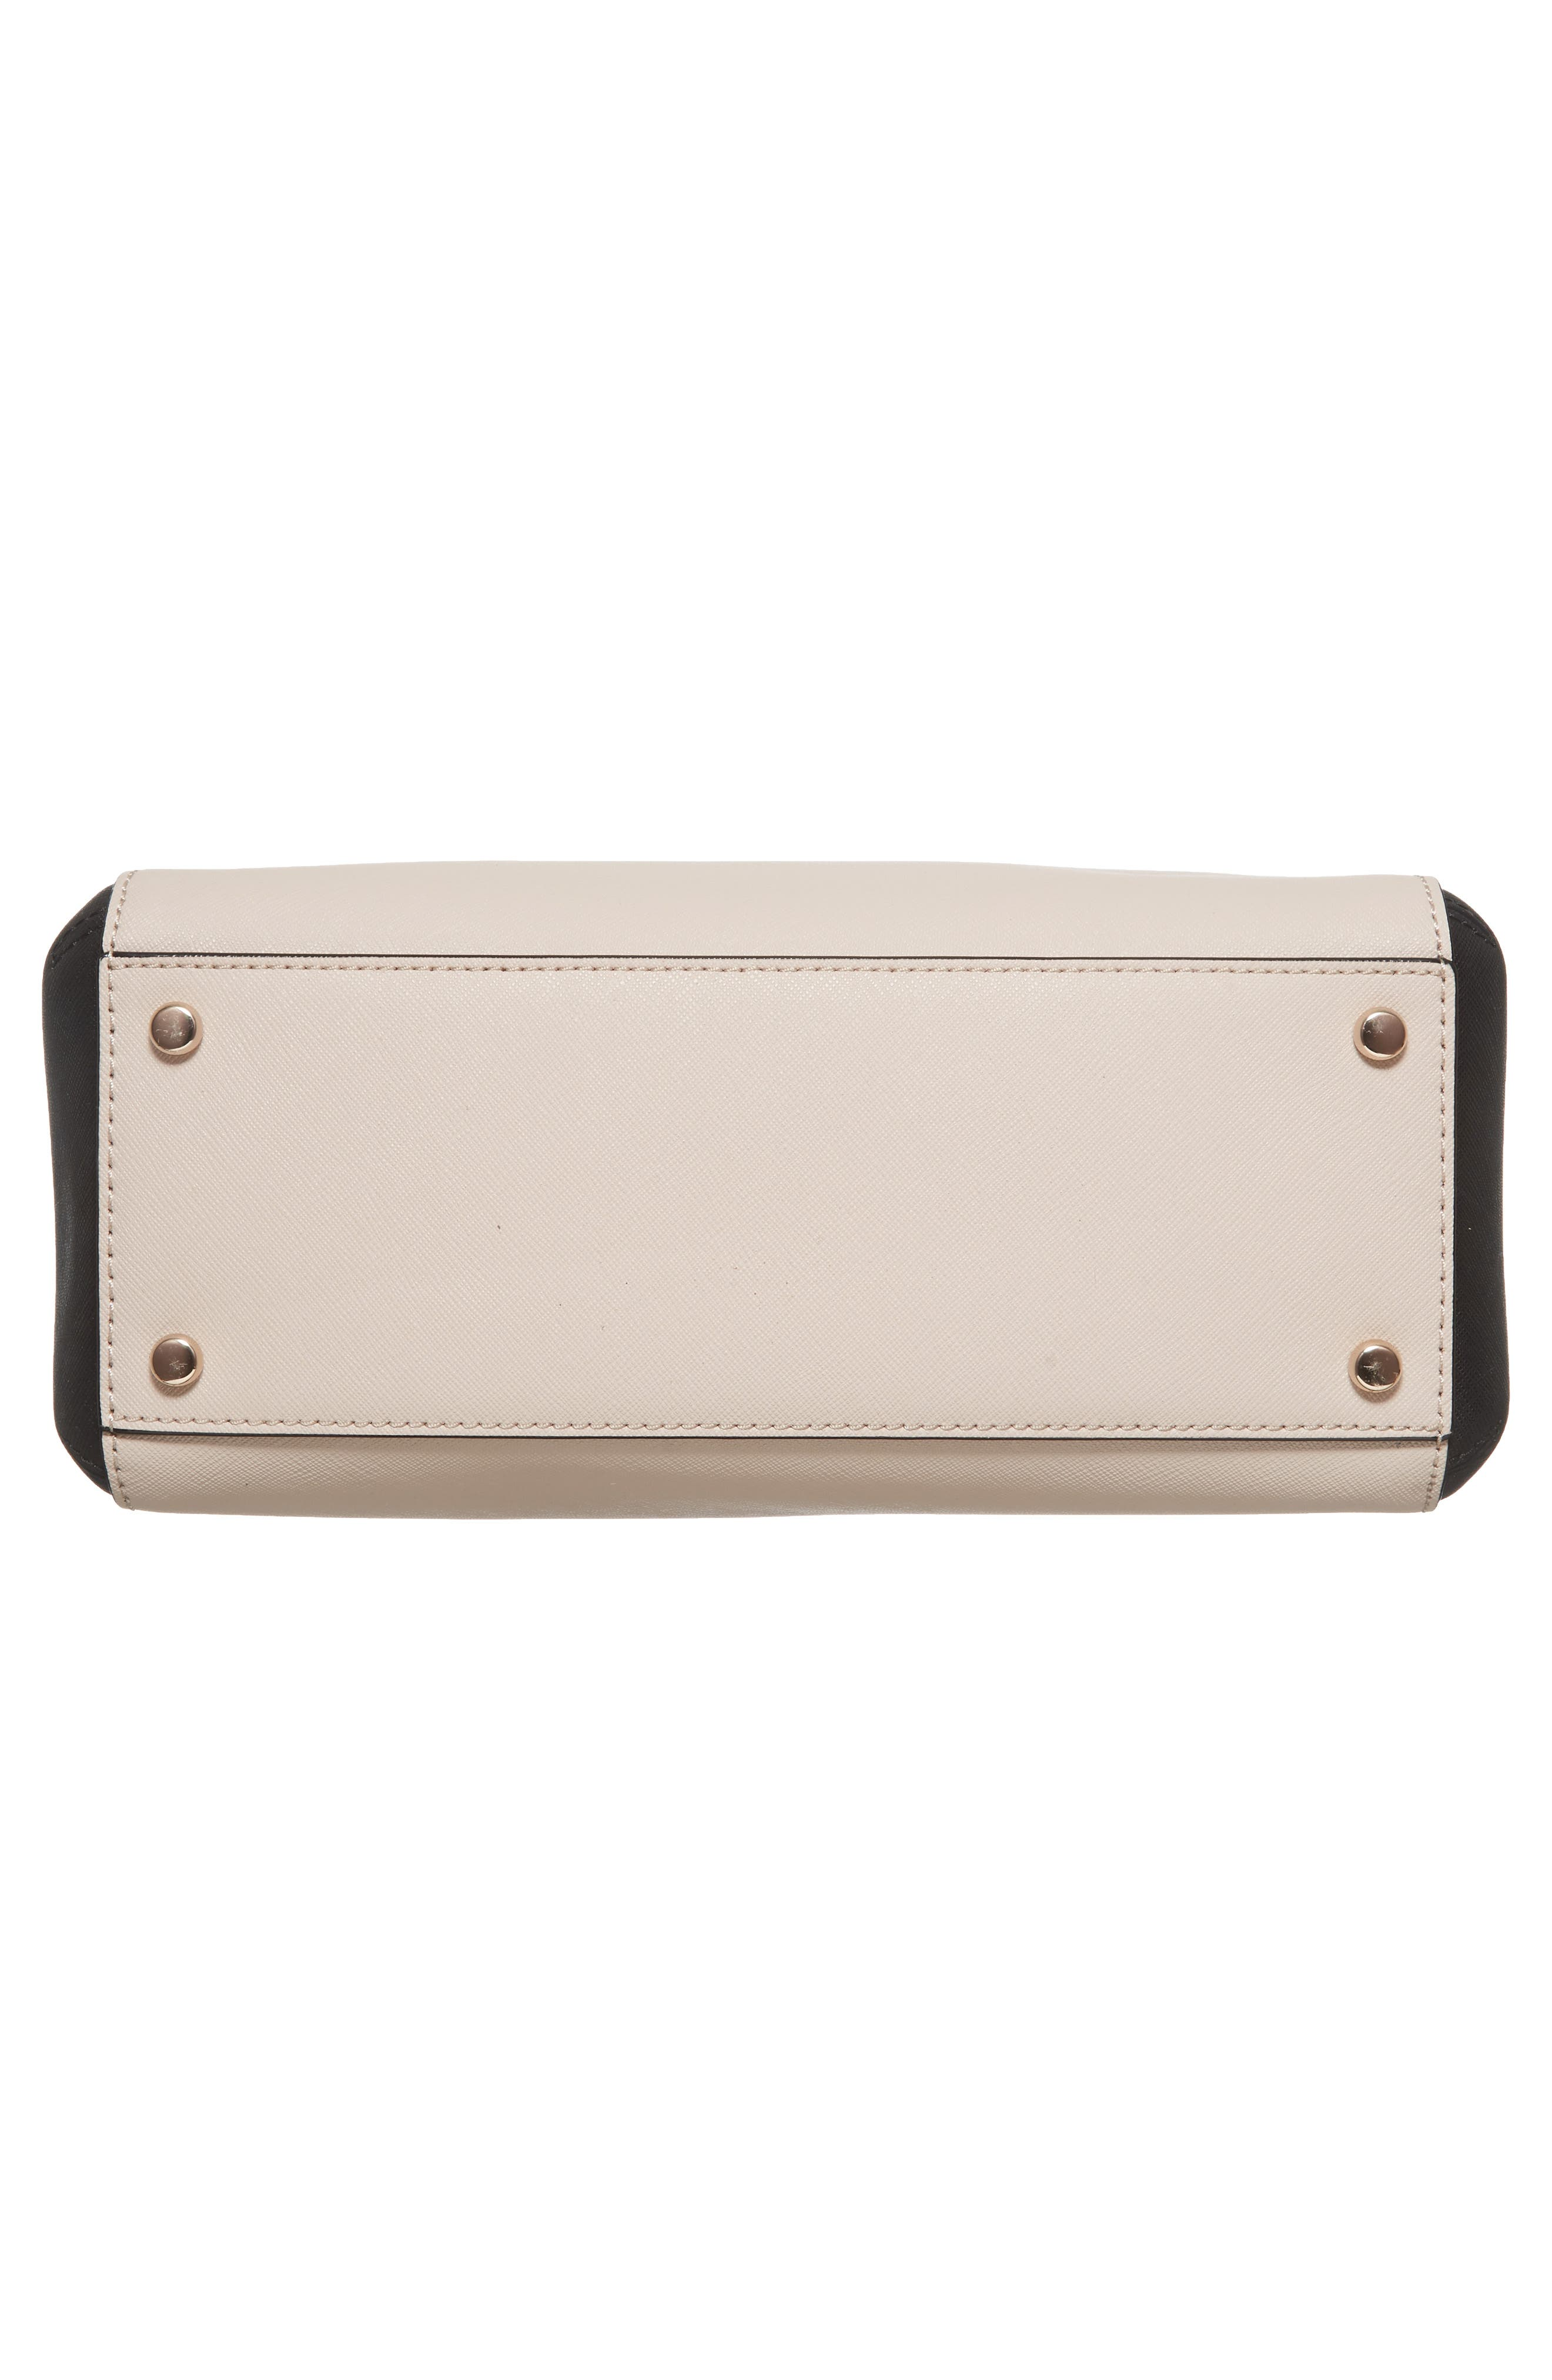 cameron street large lane leather satchel,                             Alternate thumbnail 6, color,                             005